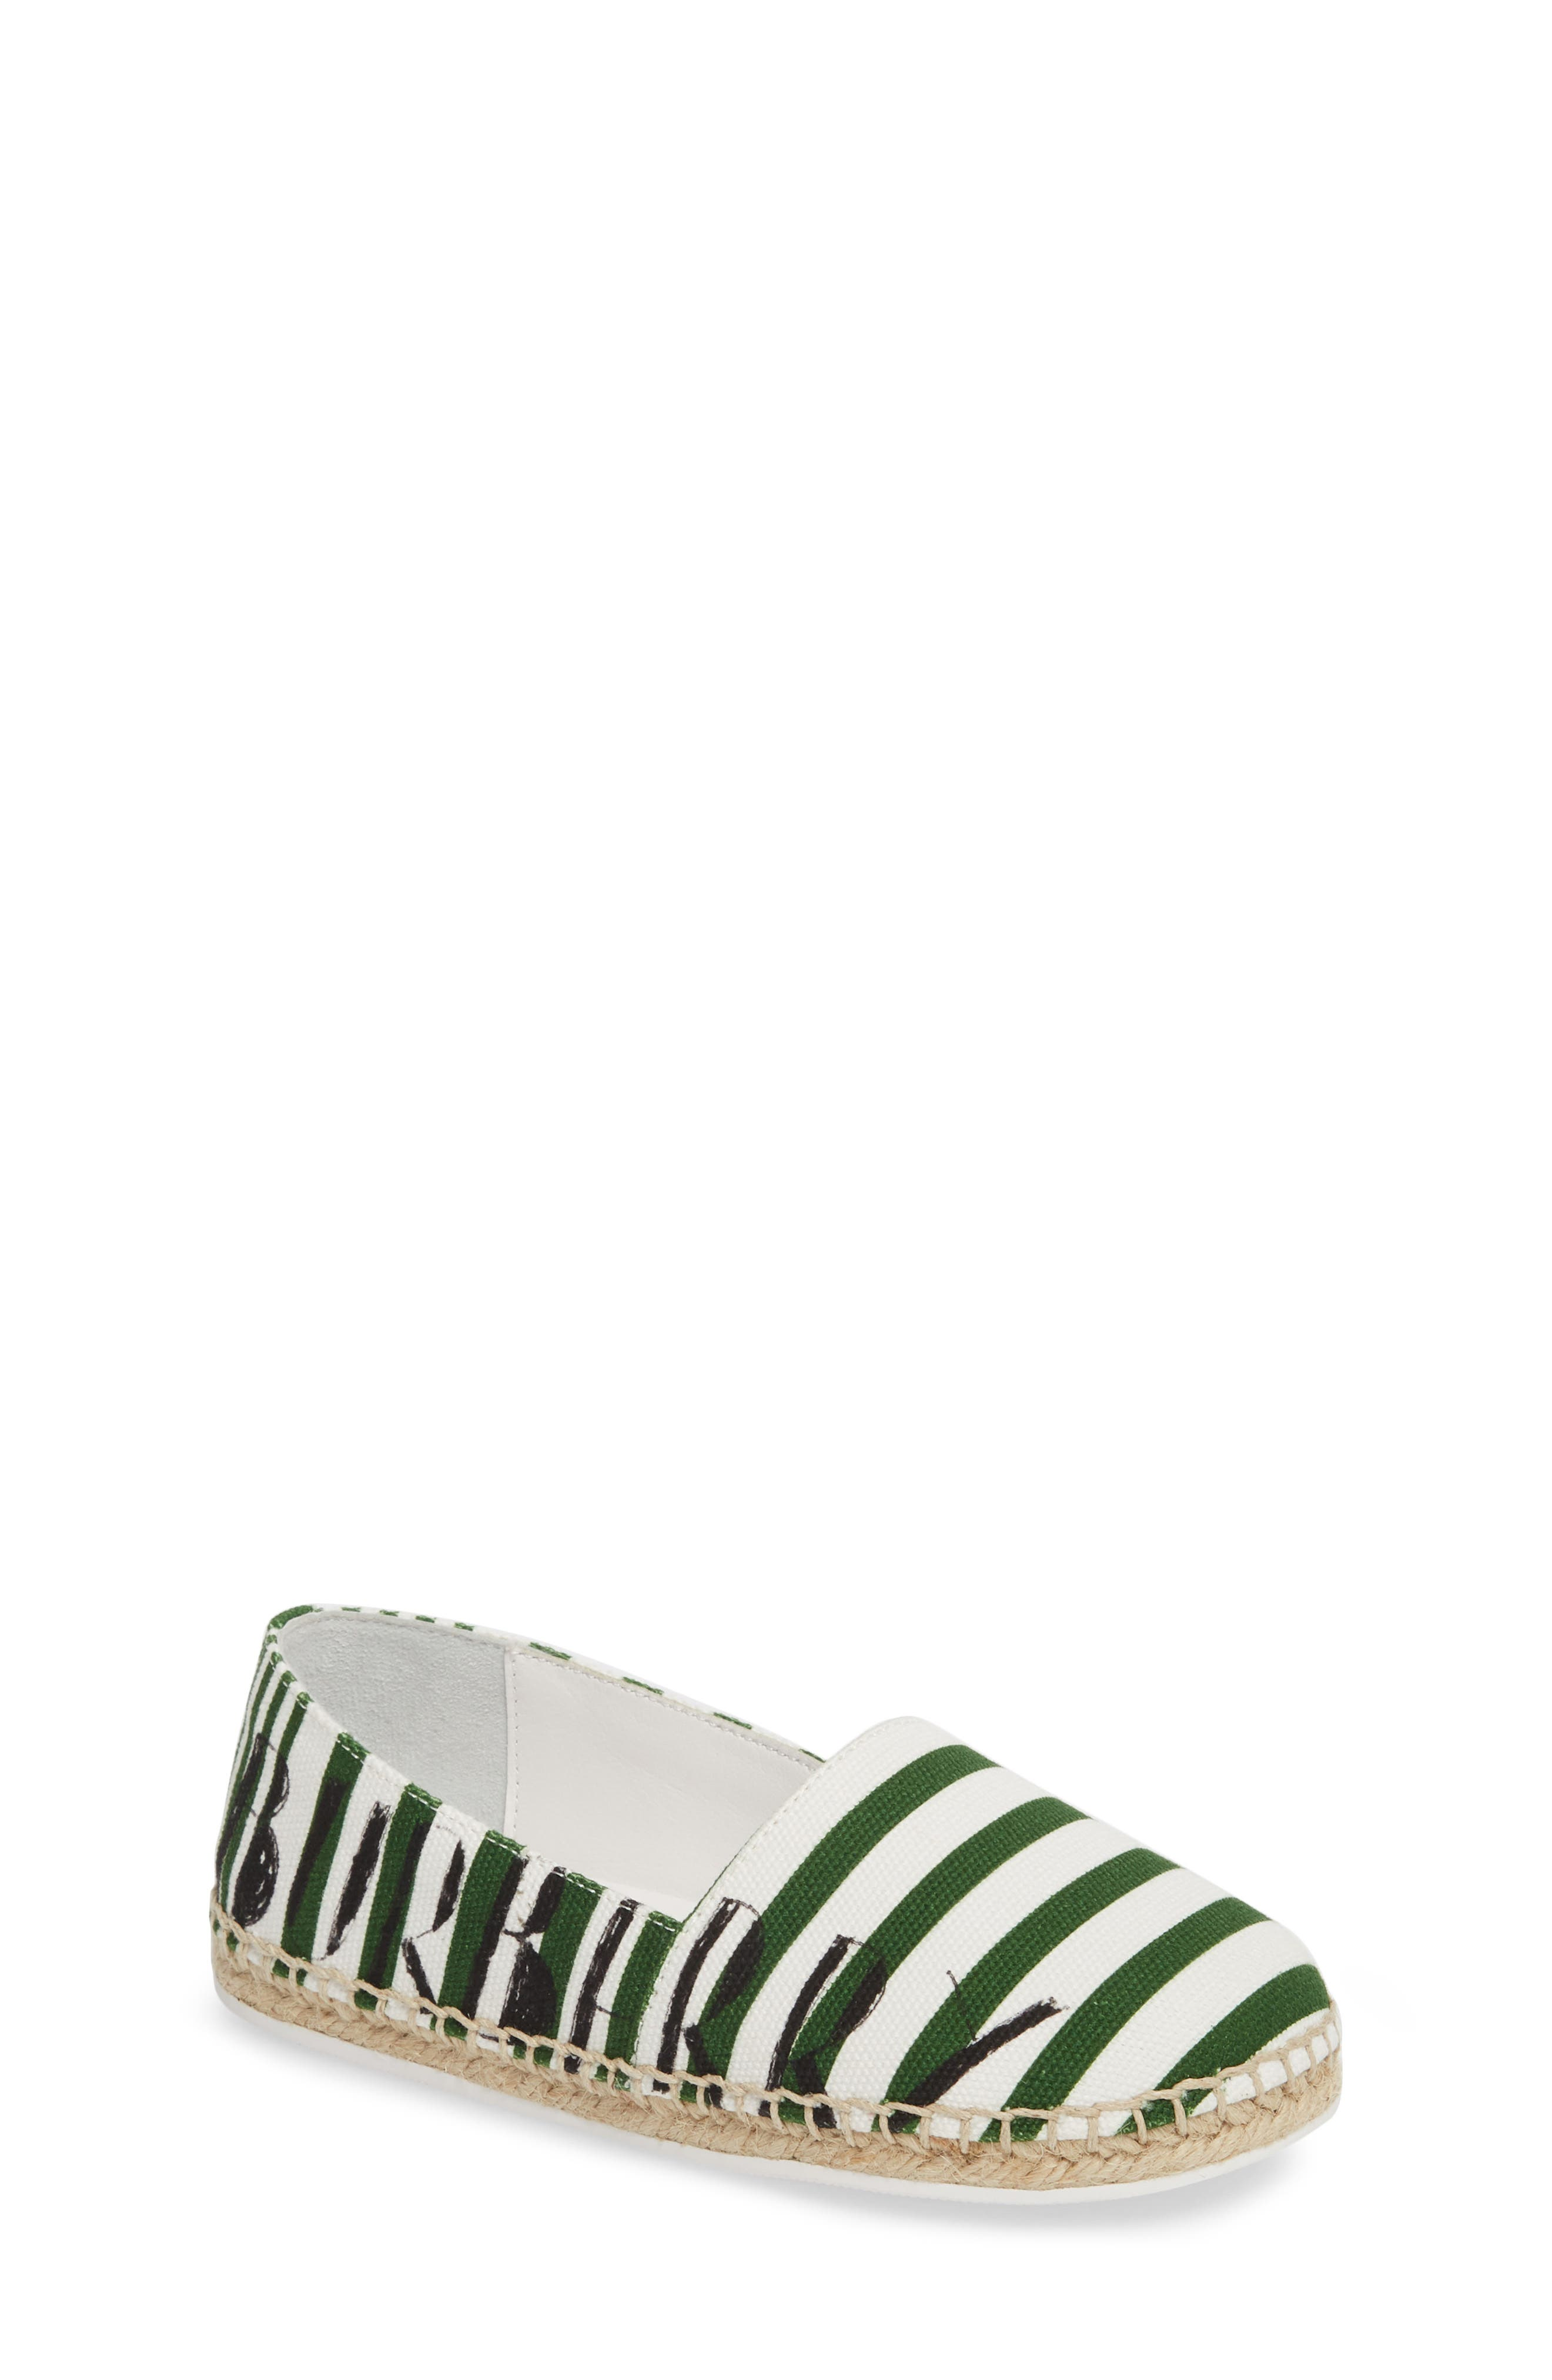 Peckfield Espadrille Slip-On,                             Main thumbnail 1, color,                             BRIGHT FERN GREEN